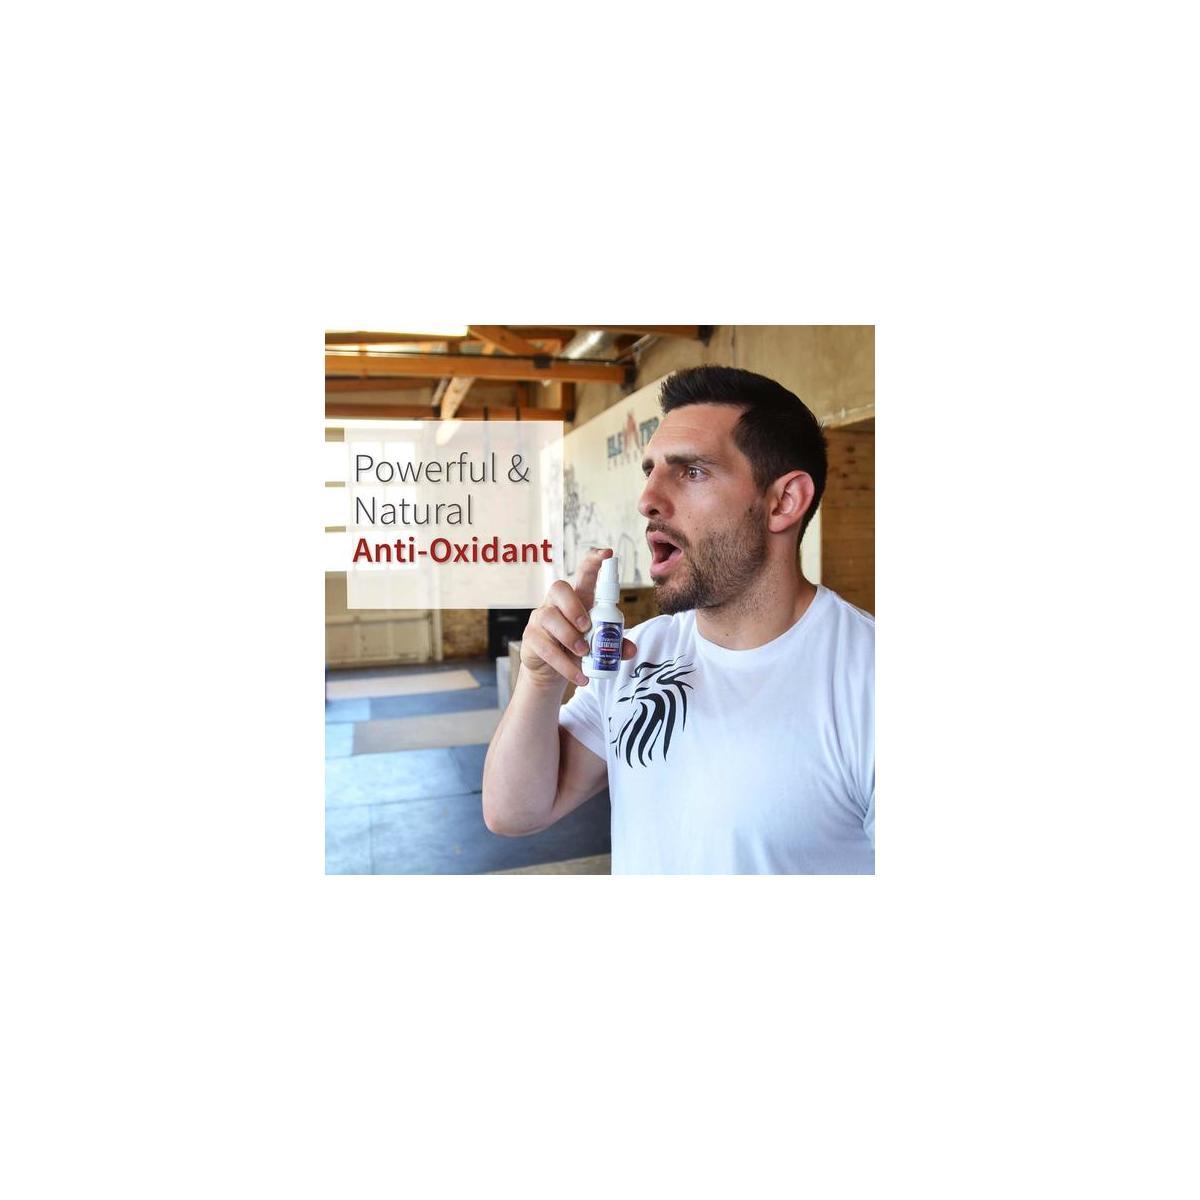 Advanced Glutathione Spray - Nature's Antioxidant, Detox & Rejuvenator - 2 oz bottle